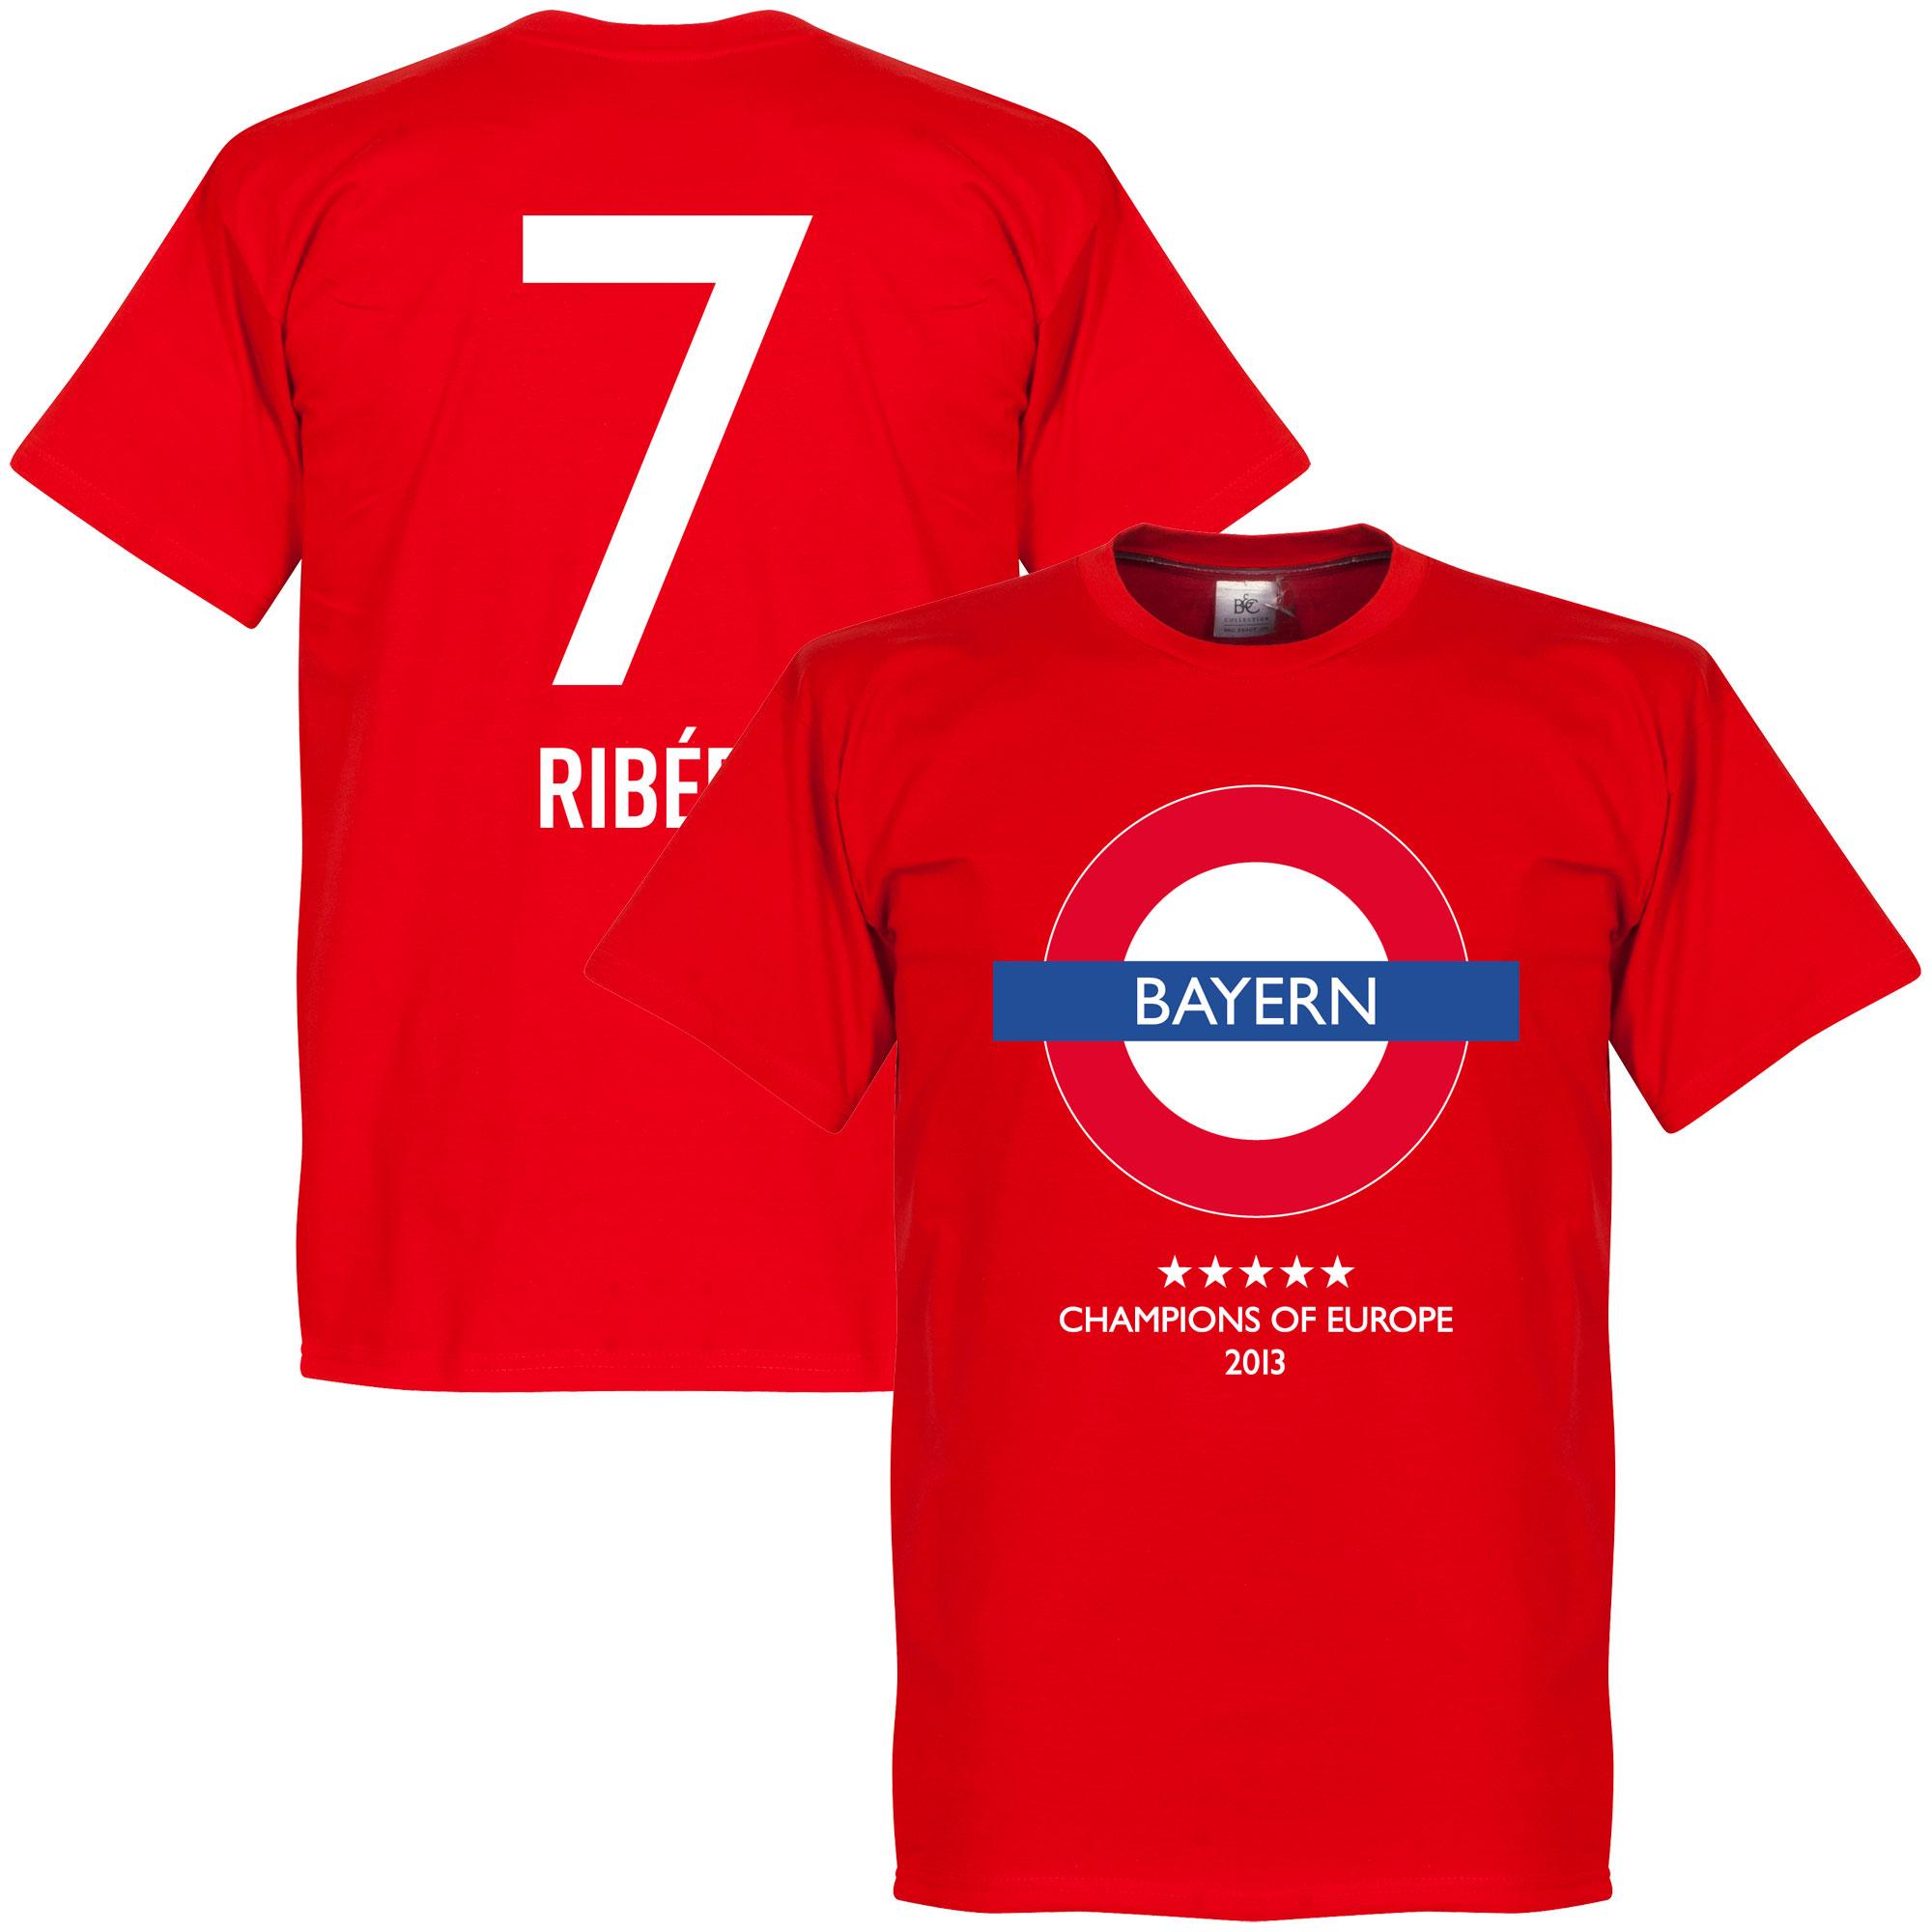 Bayern Undergrougnd Tee + Ribéry 7 - Red - L